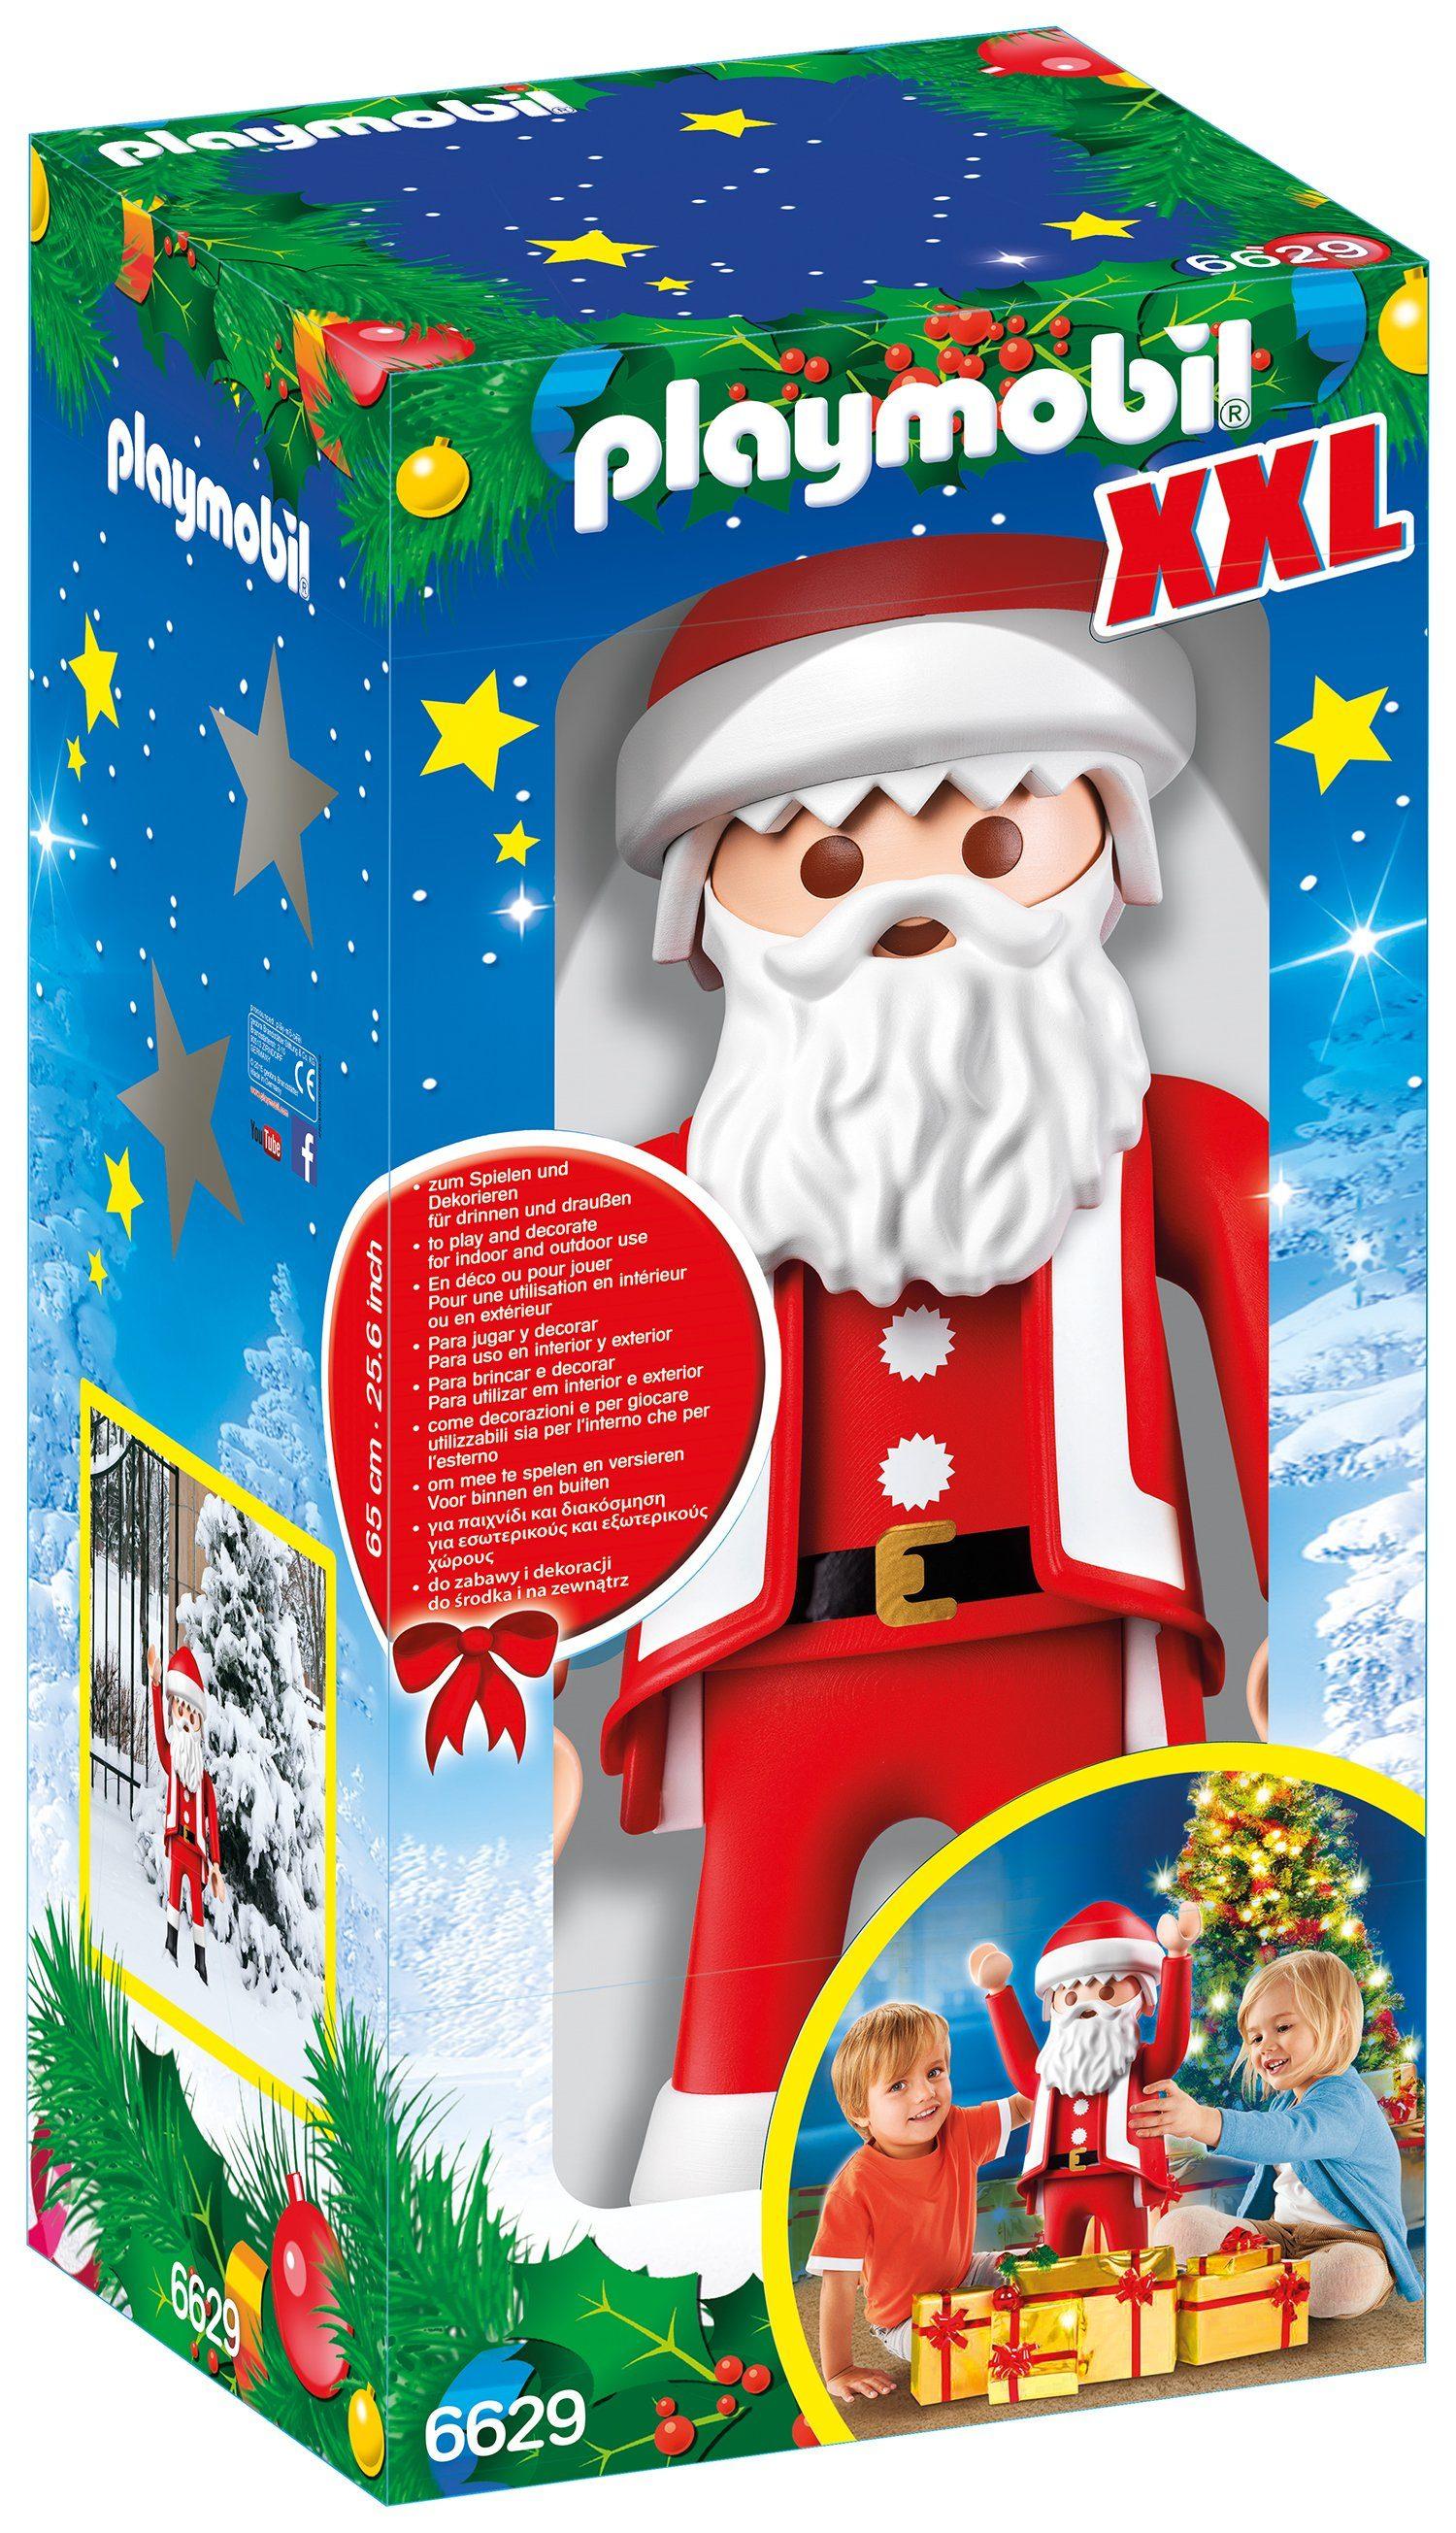 Playmobil® XXL Weihnachtsmann (6629), »Christmas«